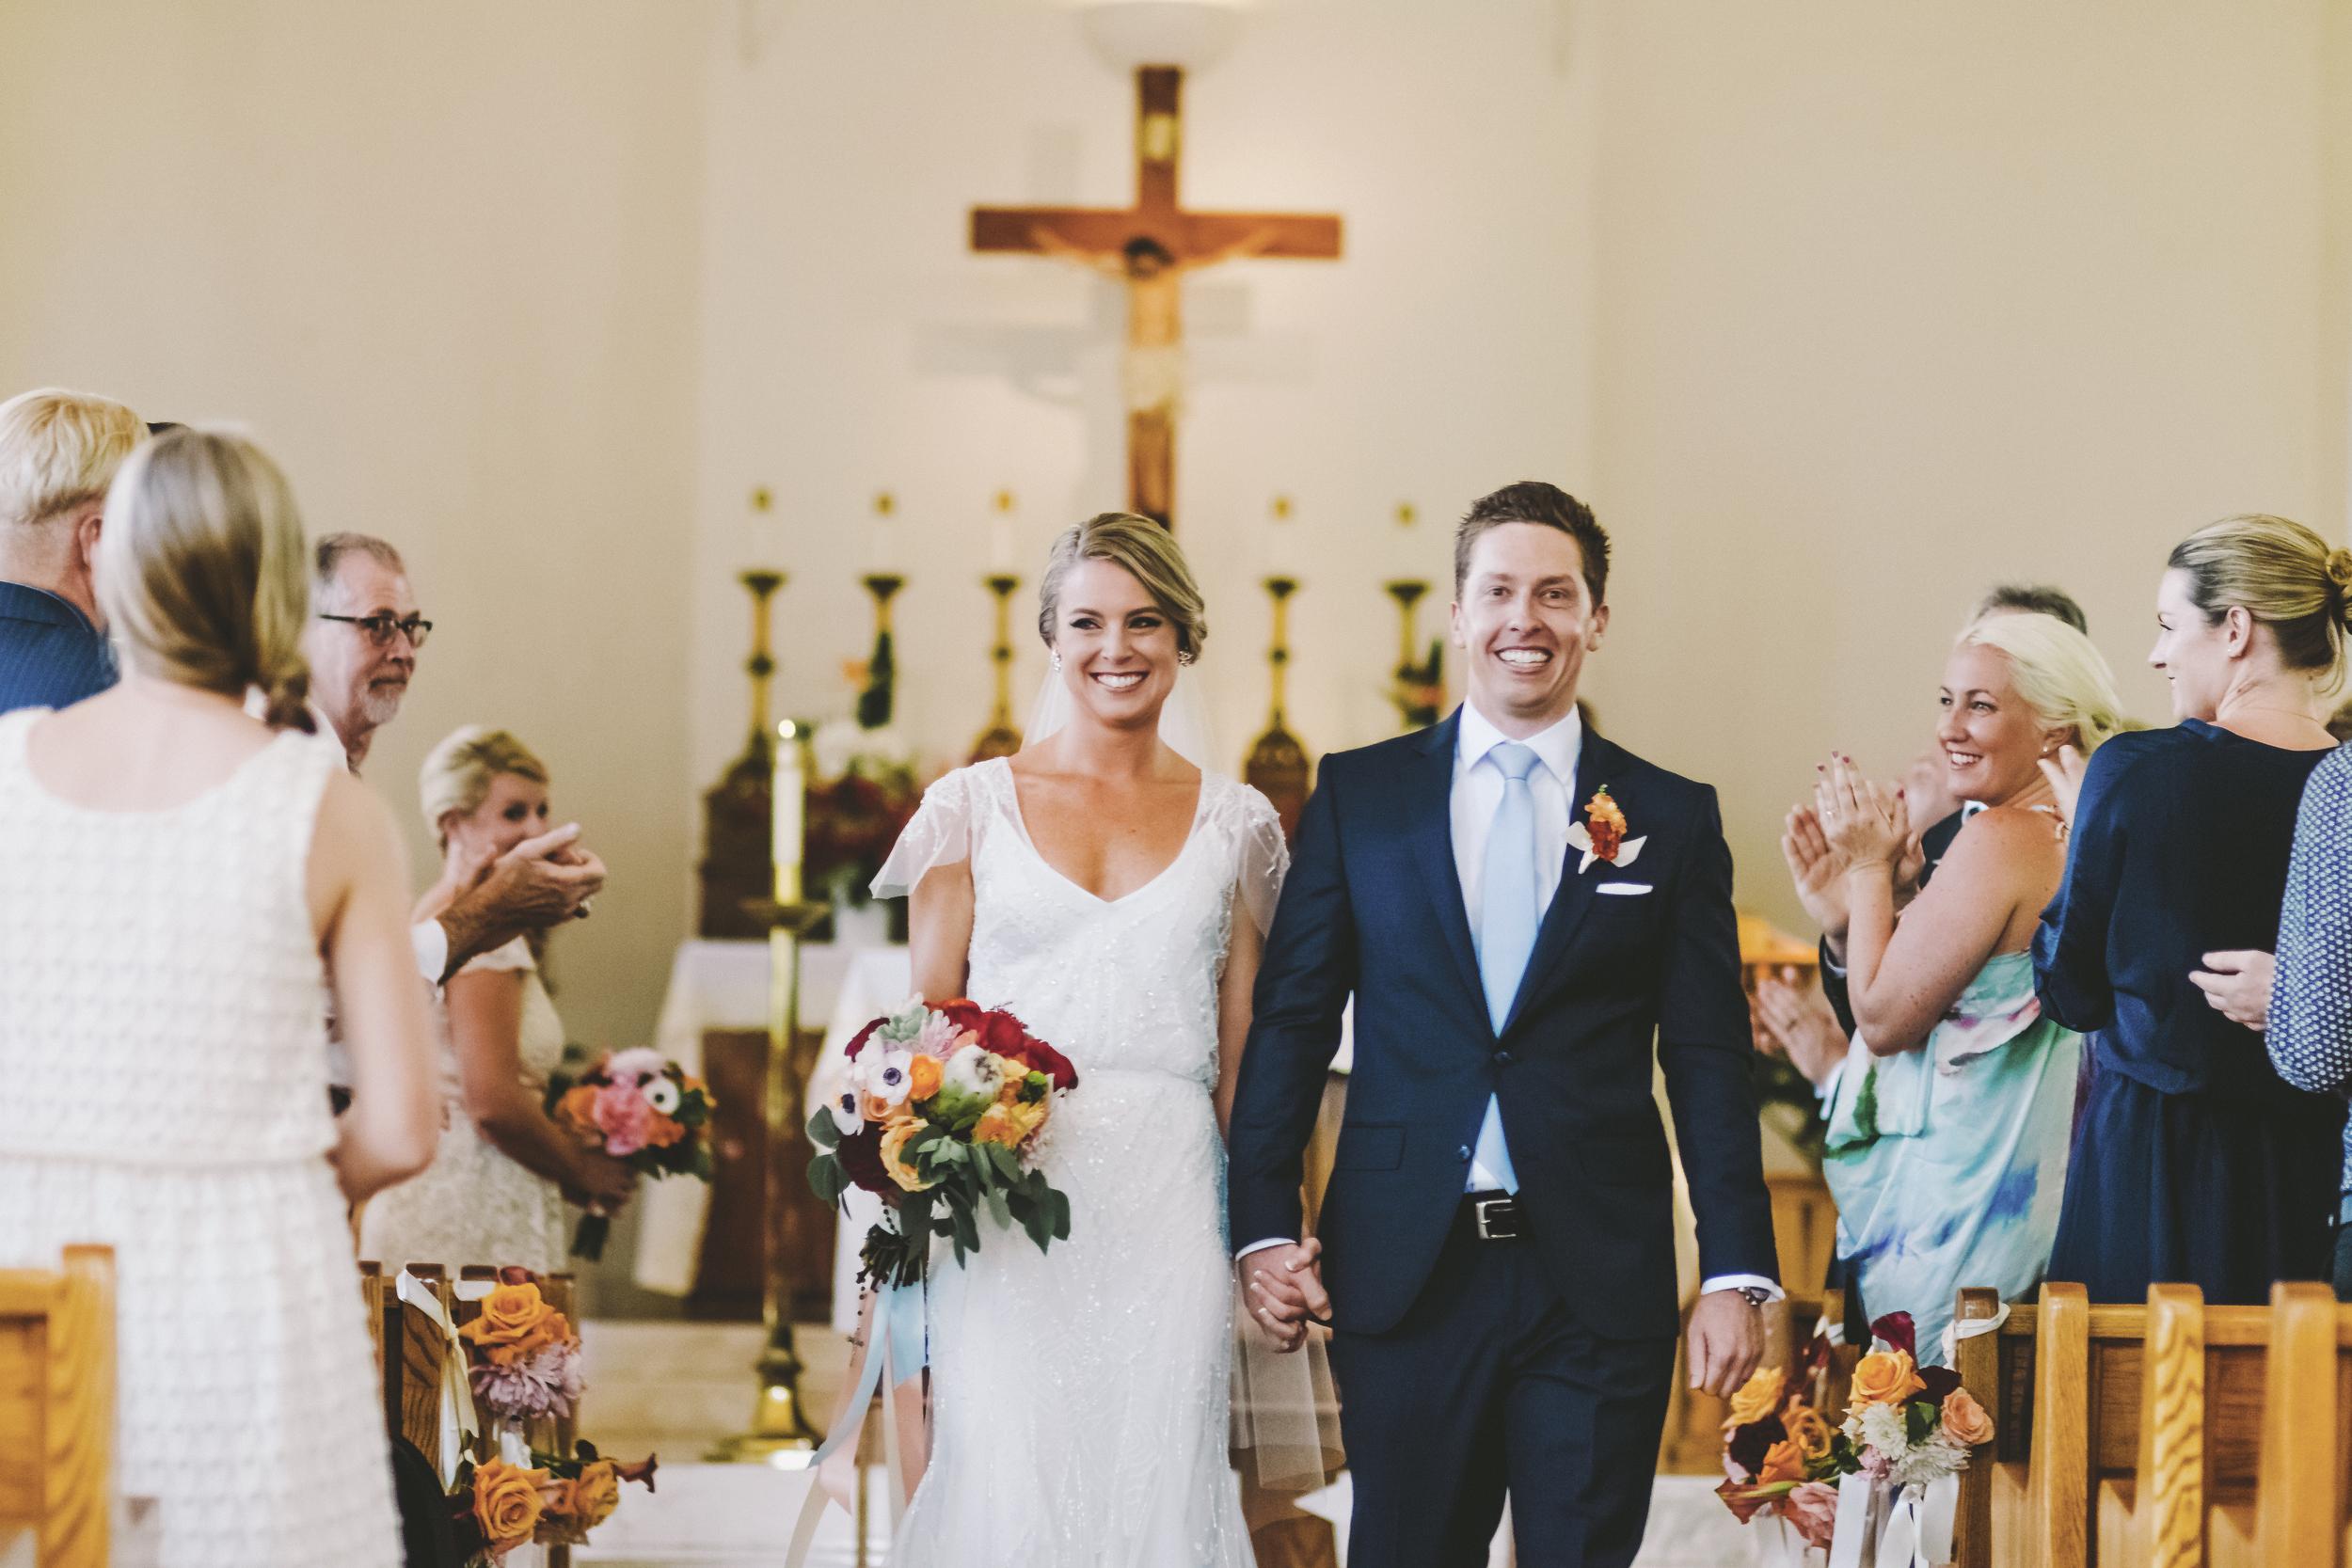 angie-diaz-photography-maui-wedding-mel-matt-44.jpeg